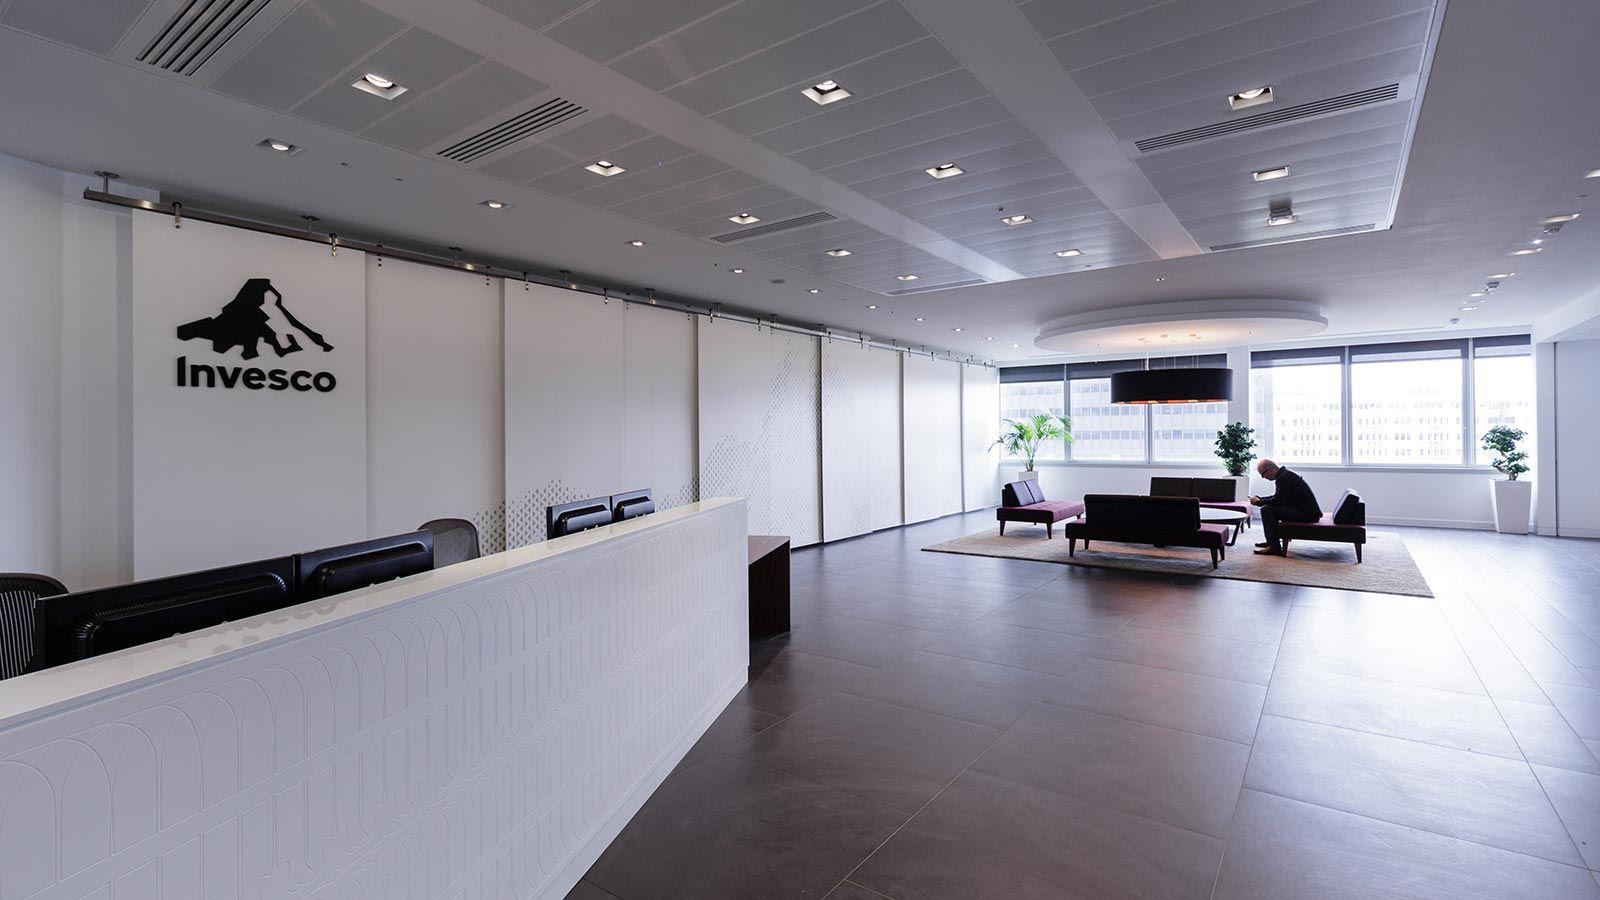 Reception Desk, Invesco - Mace Group